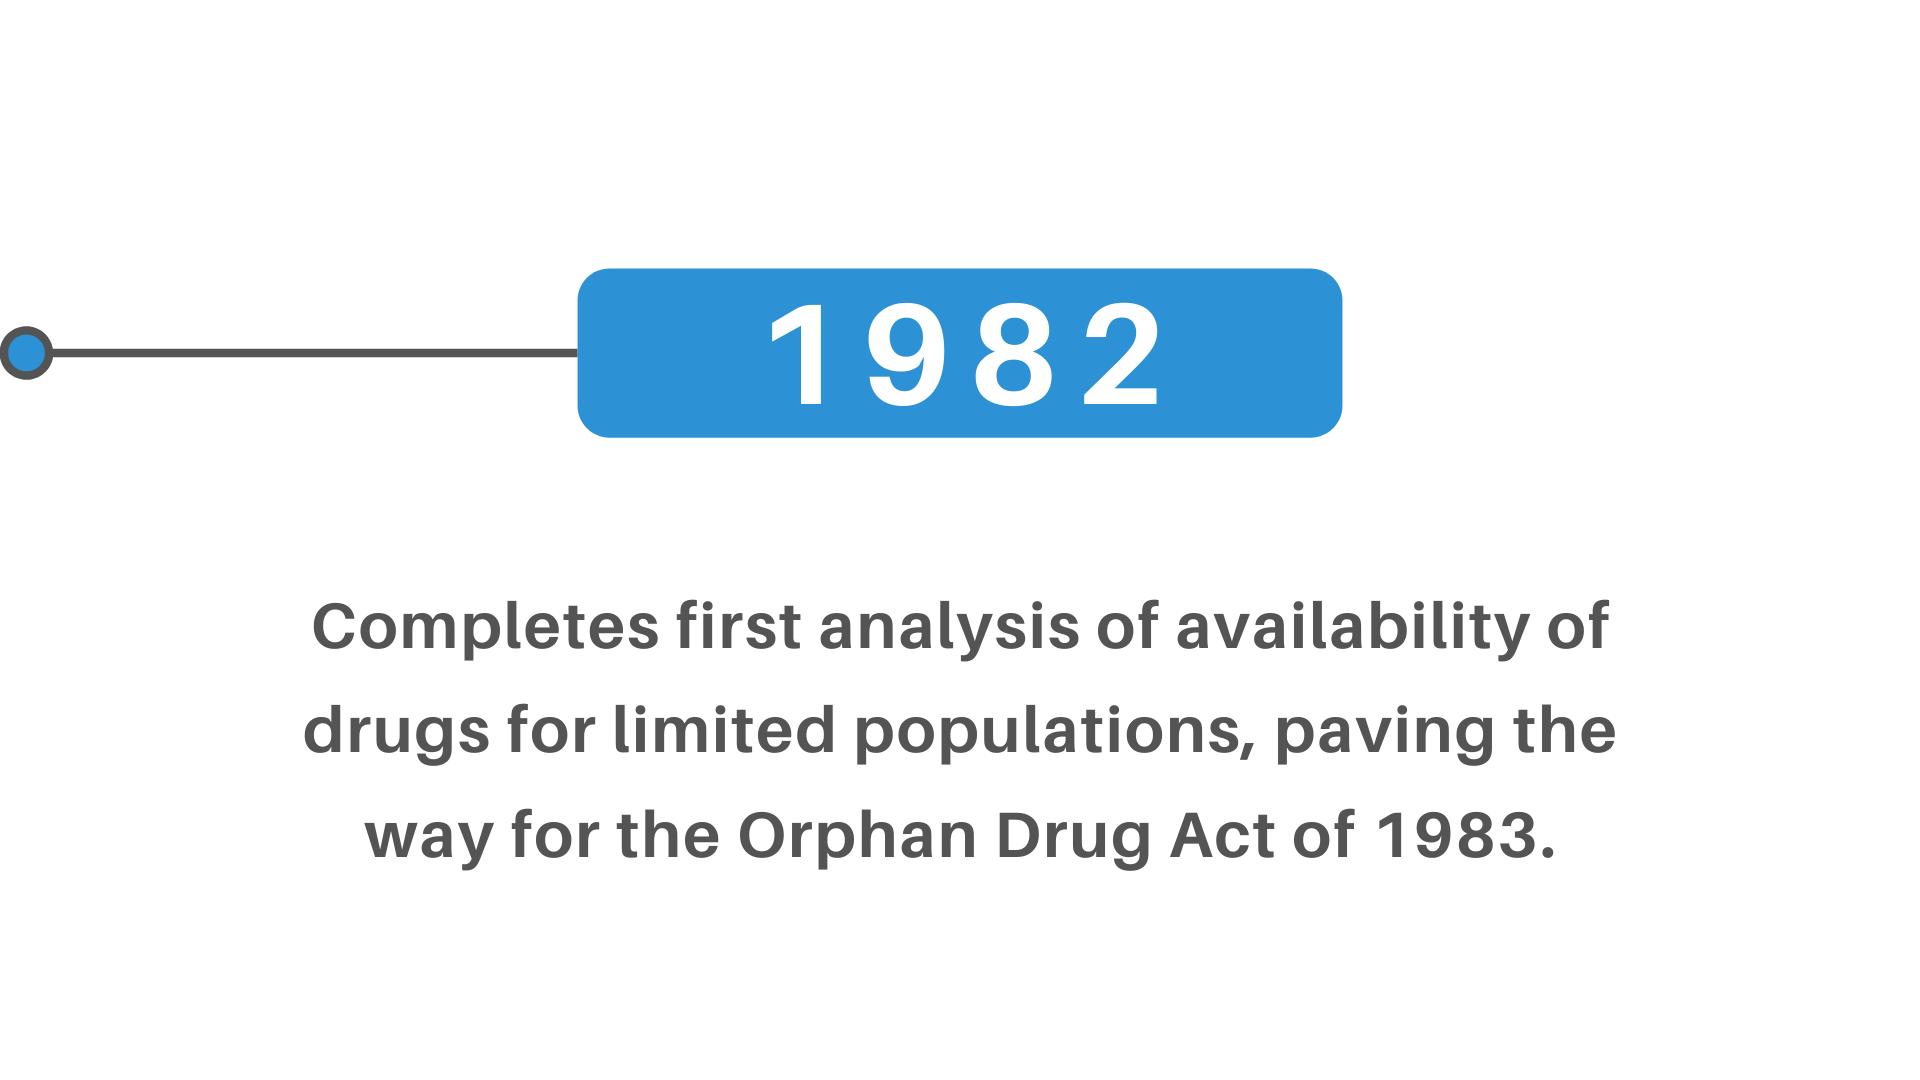 orphan drug act